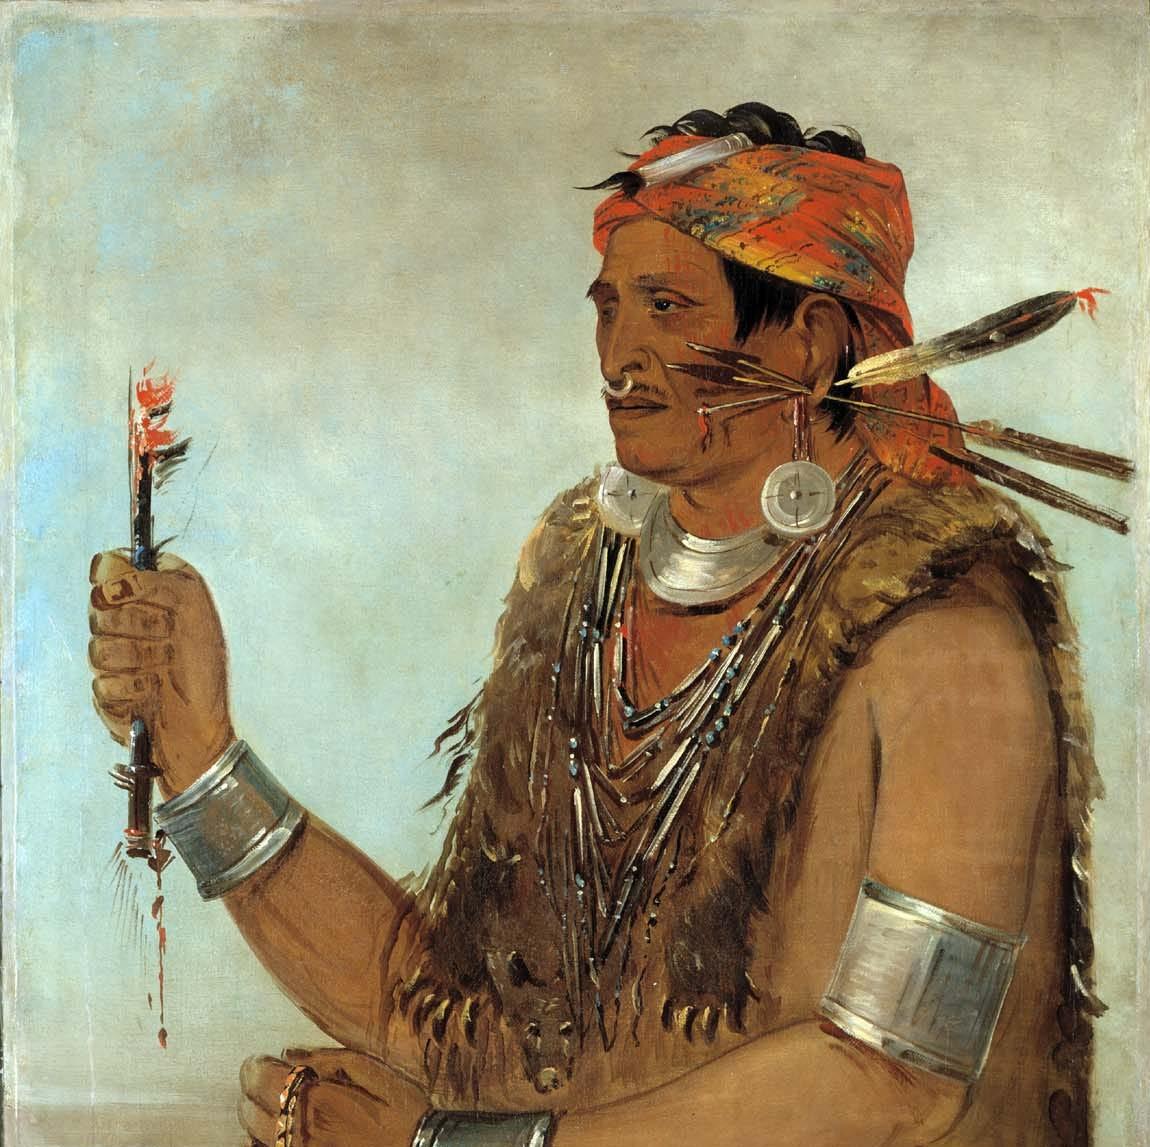 Bygone Muncie: Beata's teachings prompt purges among the Lenape